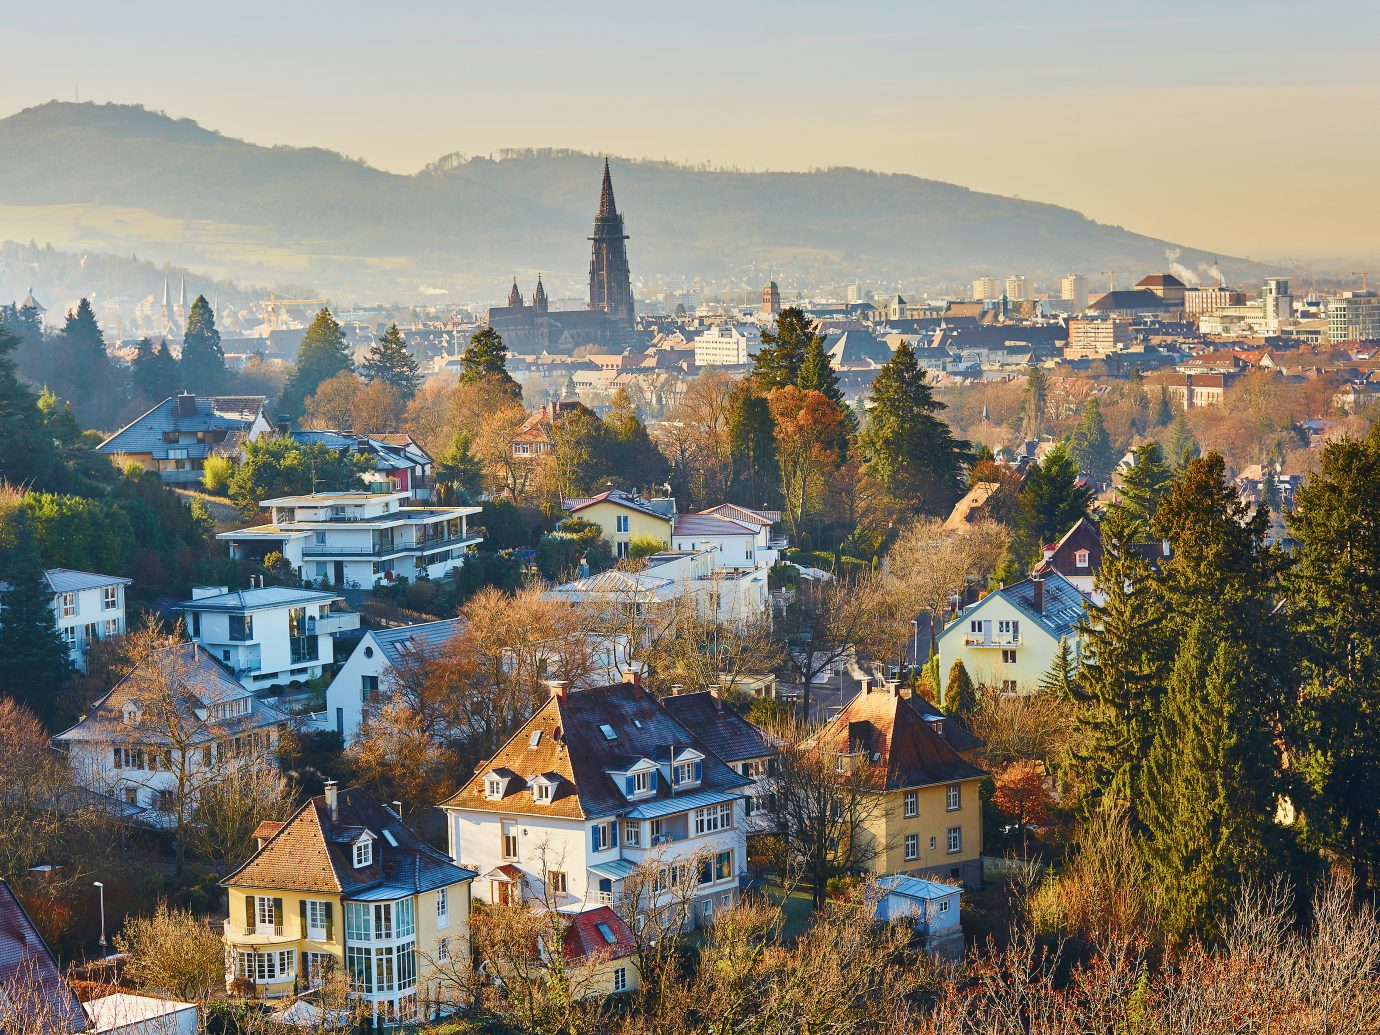 Beautiful panorama of Freiburg im Breisgau in Germany